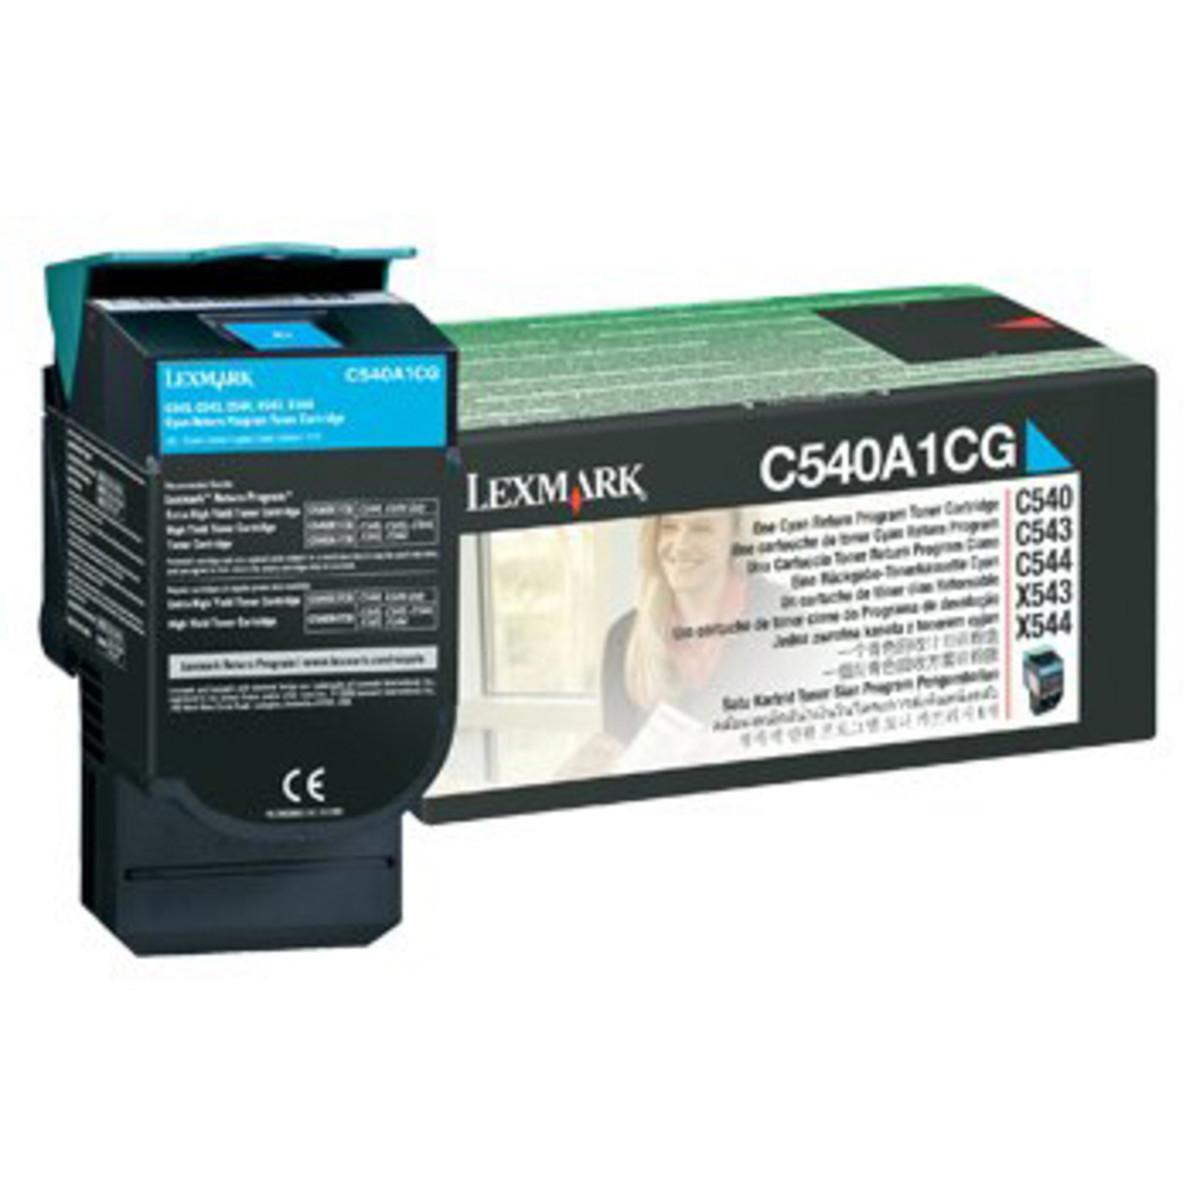 Lexmark C540A1CG Prebate Toner Cartridge